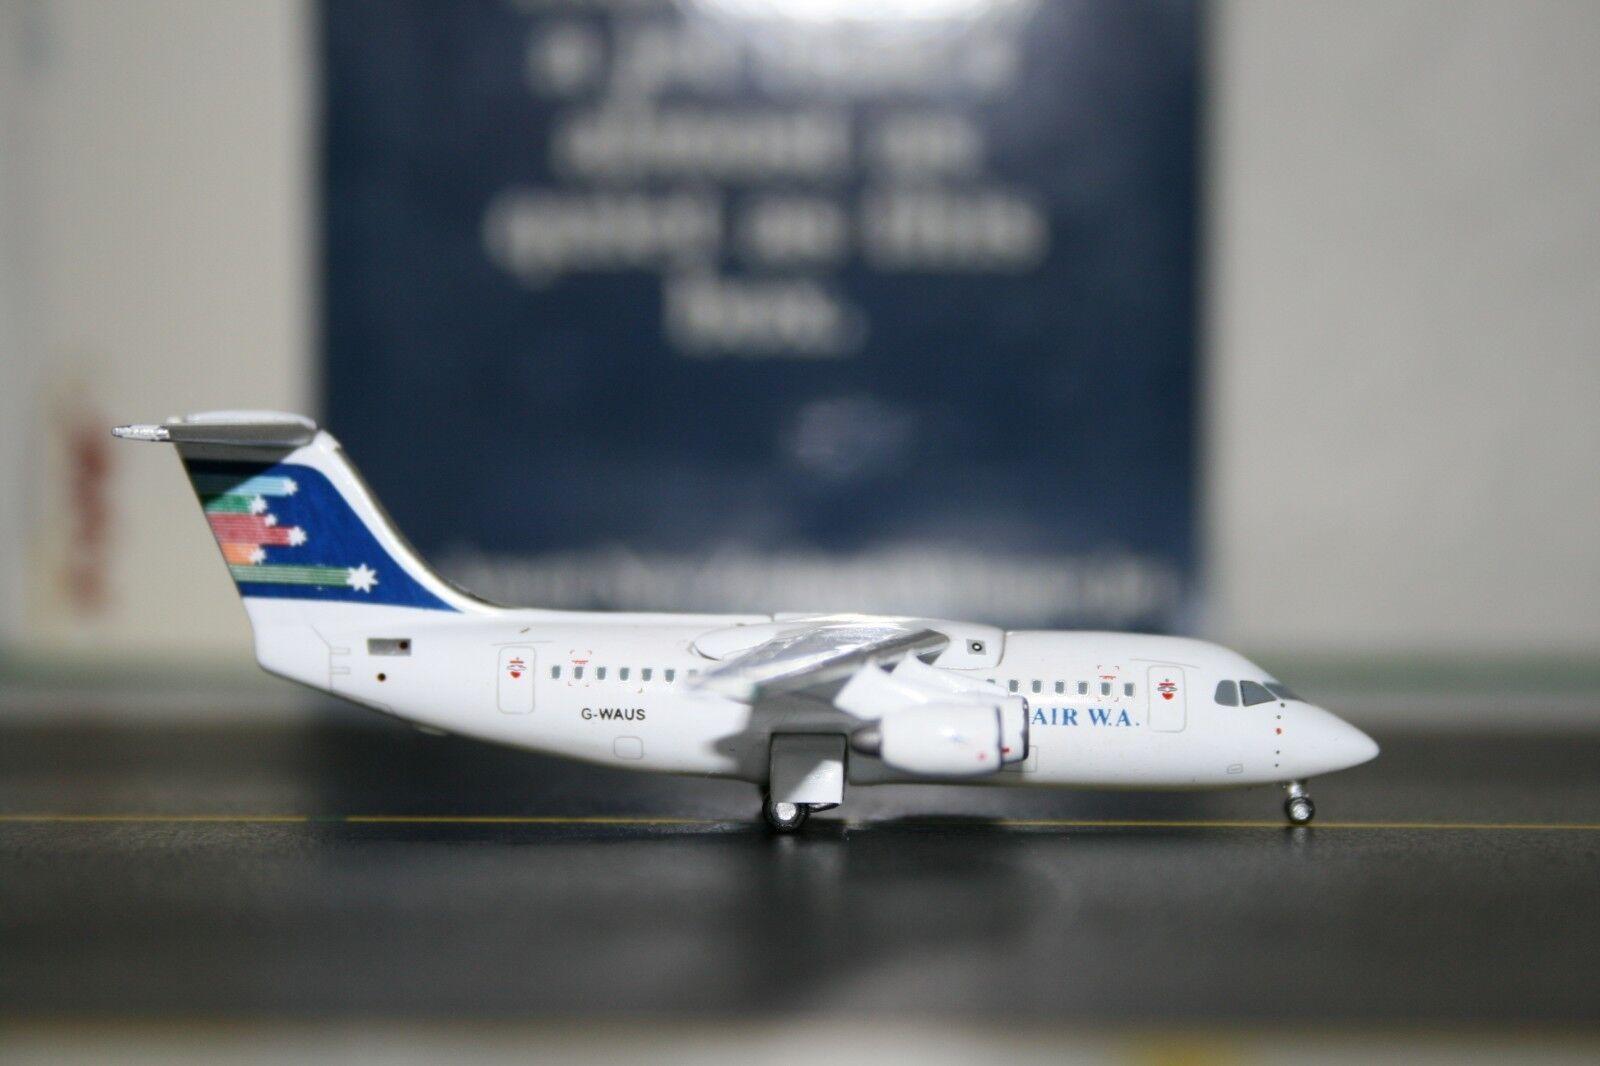 Jet-X 1 400 Ansett Air WA BAE-146 G-WAUS (JX339) Die-Cast Model Plane